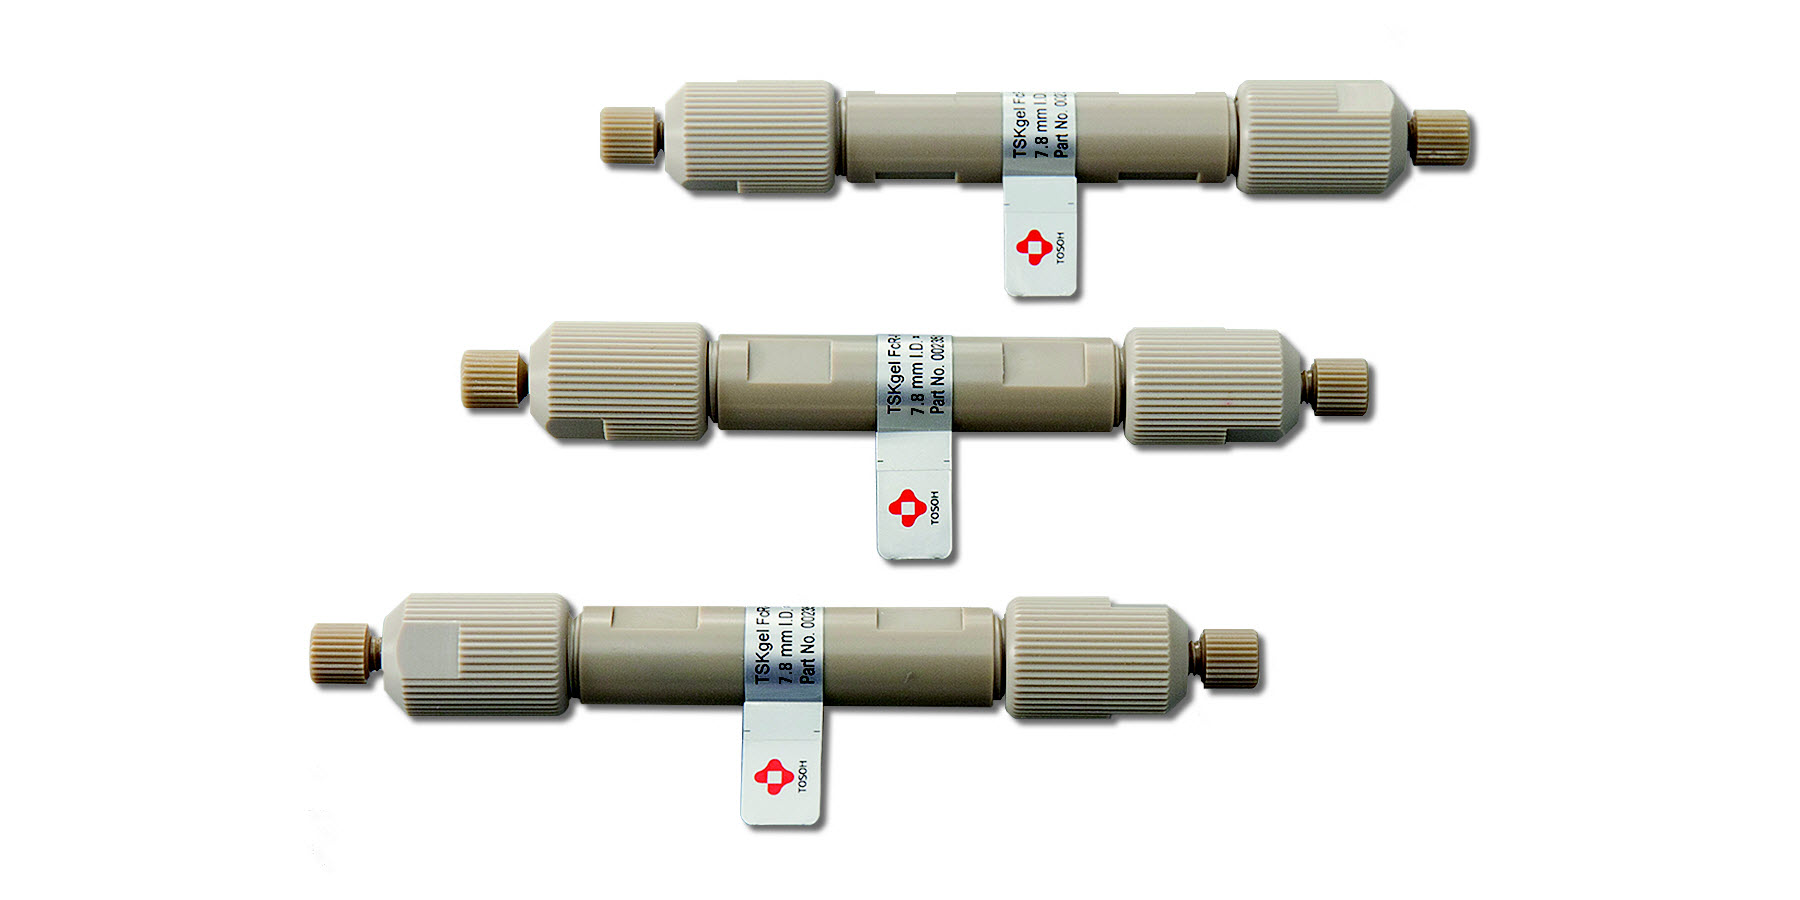 Tosoh Bioscience Introduces TSKgel® FcR-IIIA-5PW HPLC